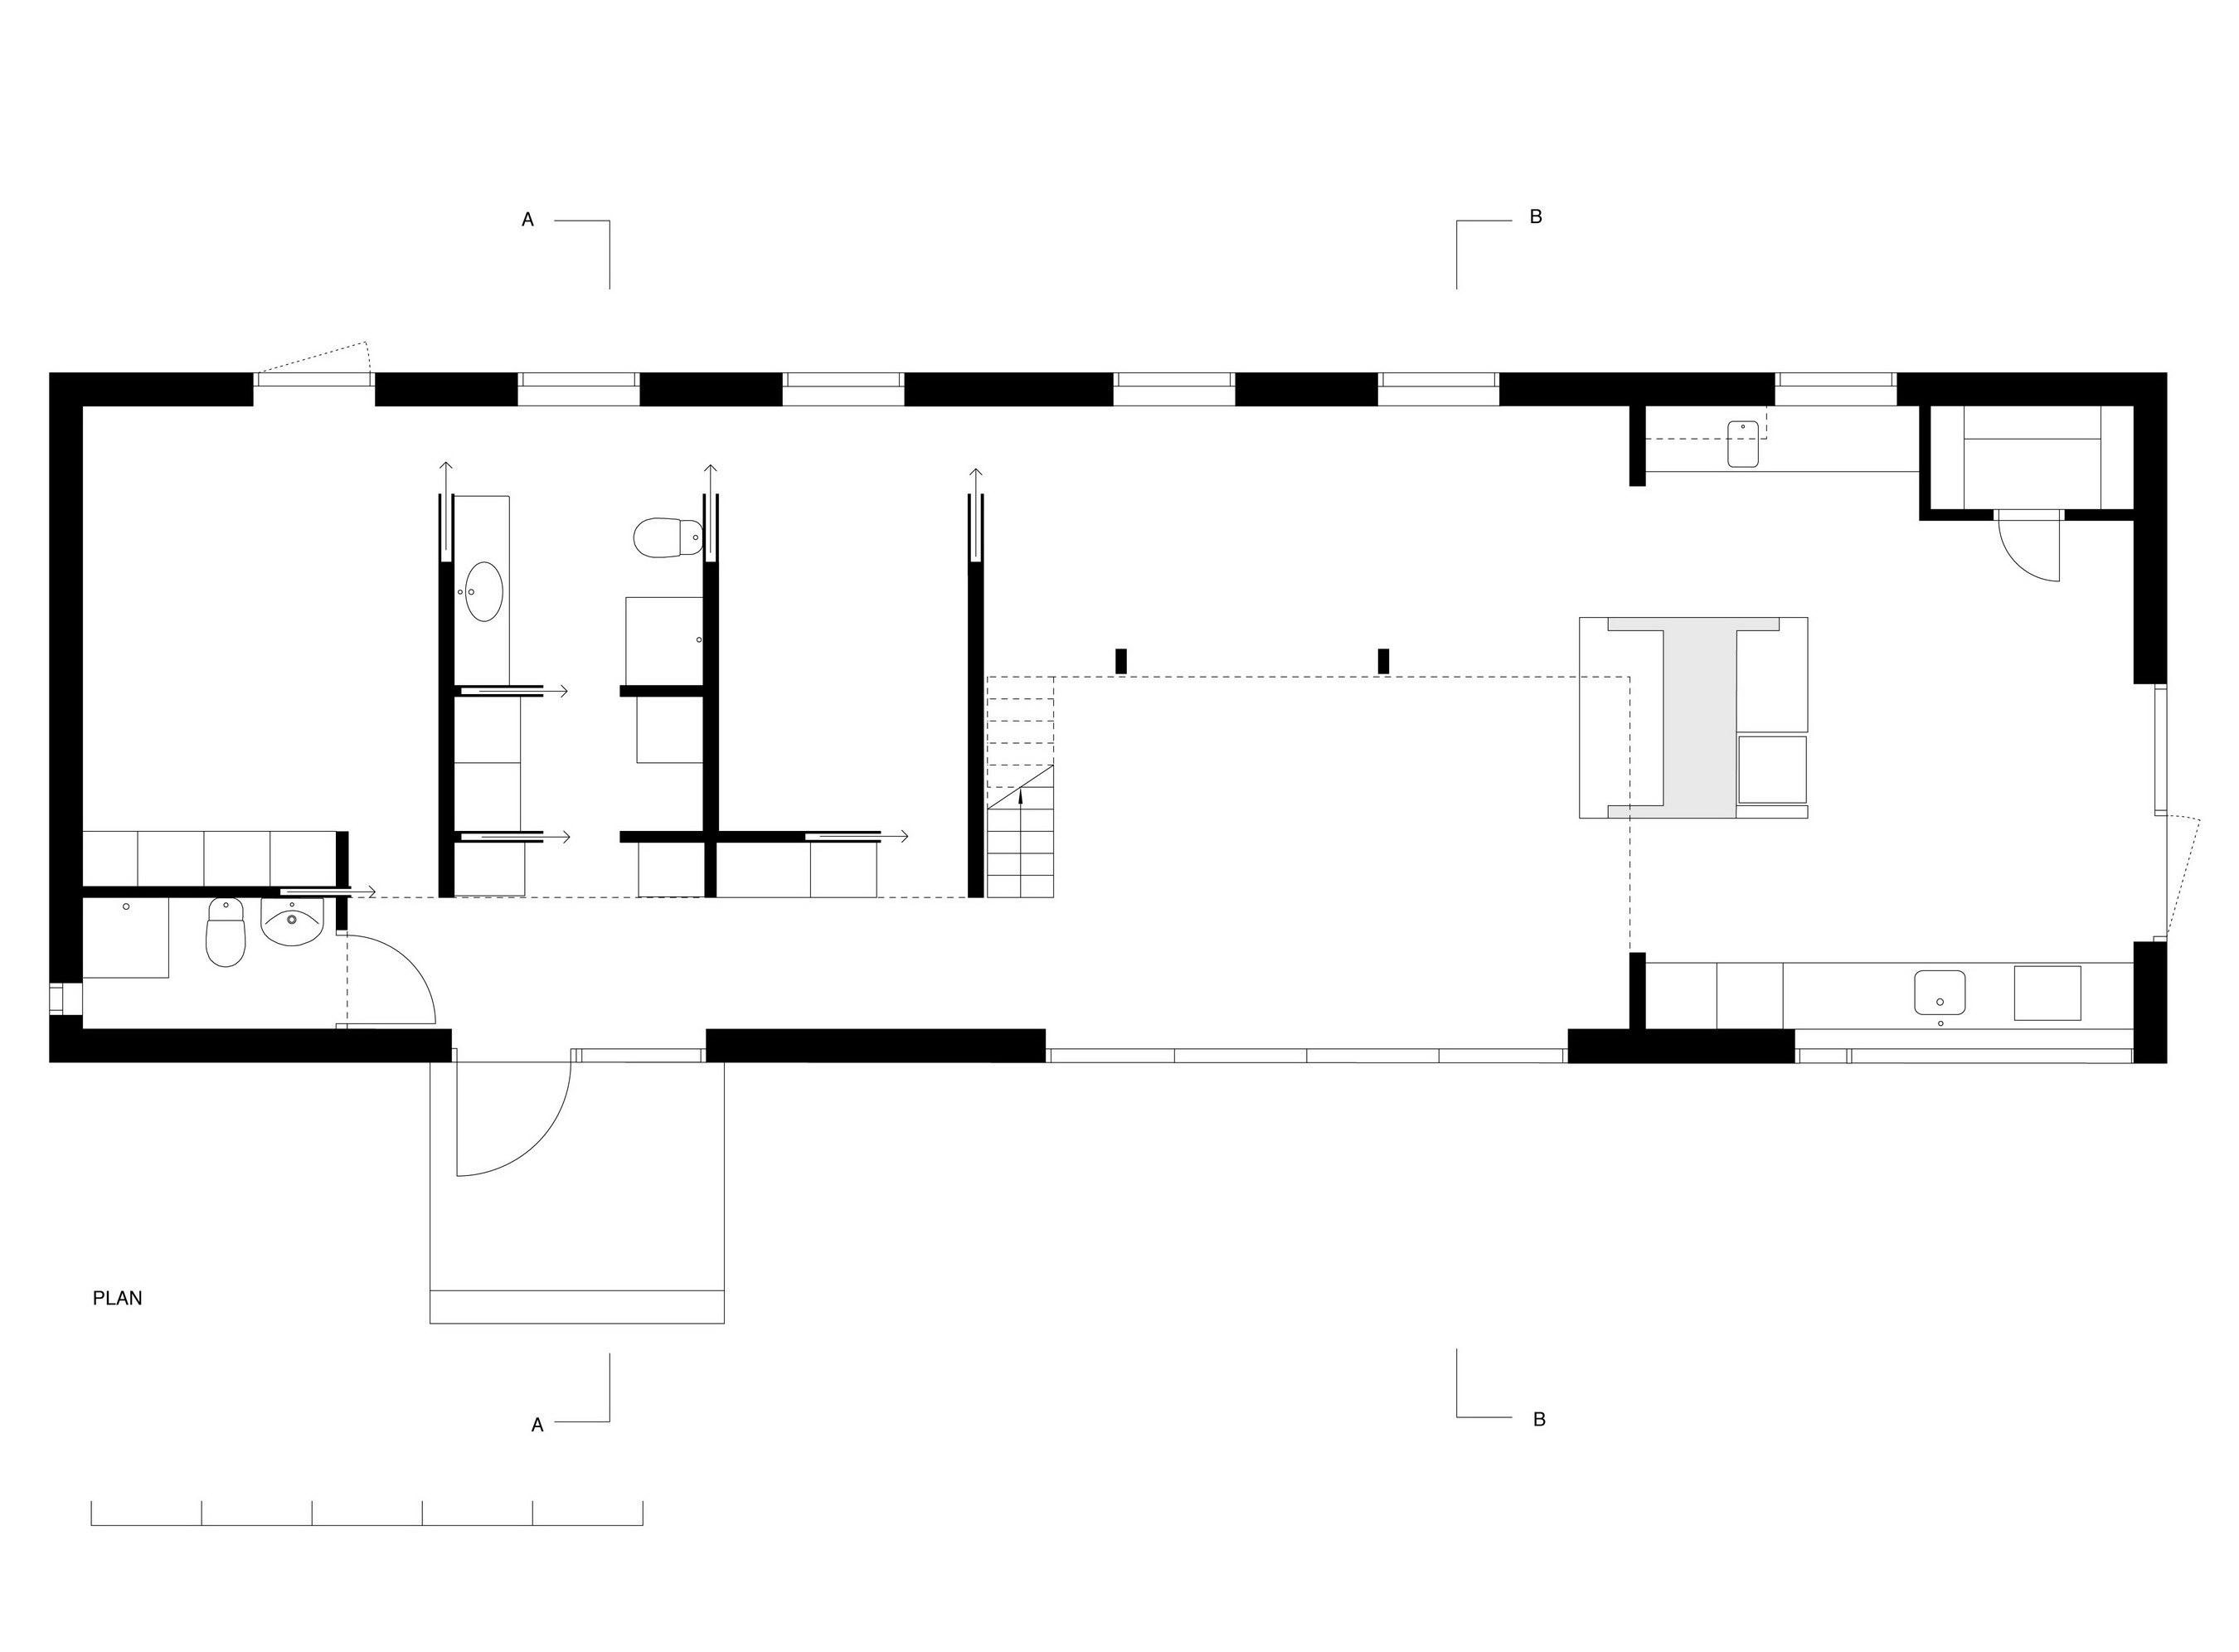 Simple House at Lake Båven by M.B.A.